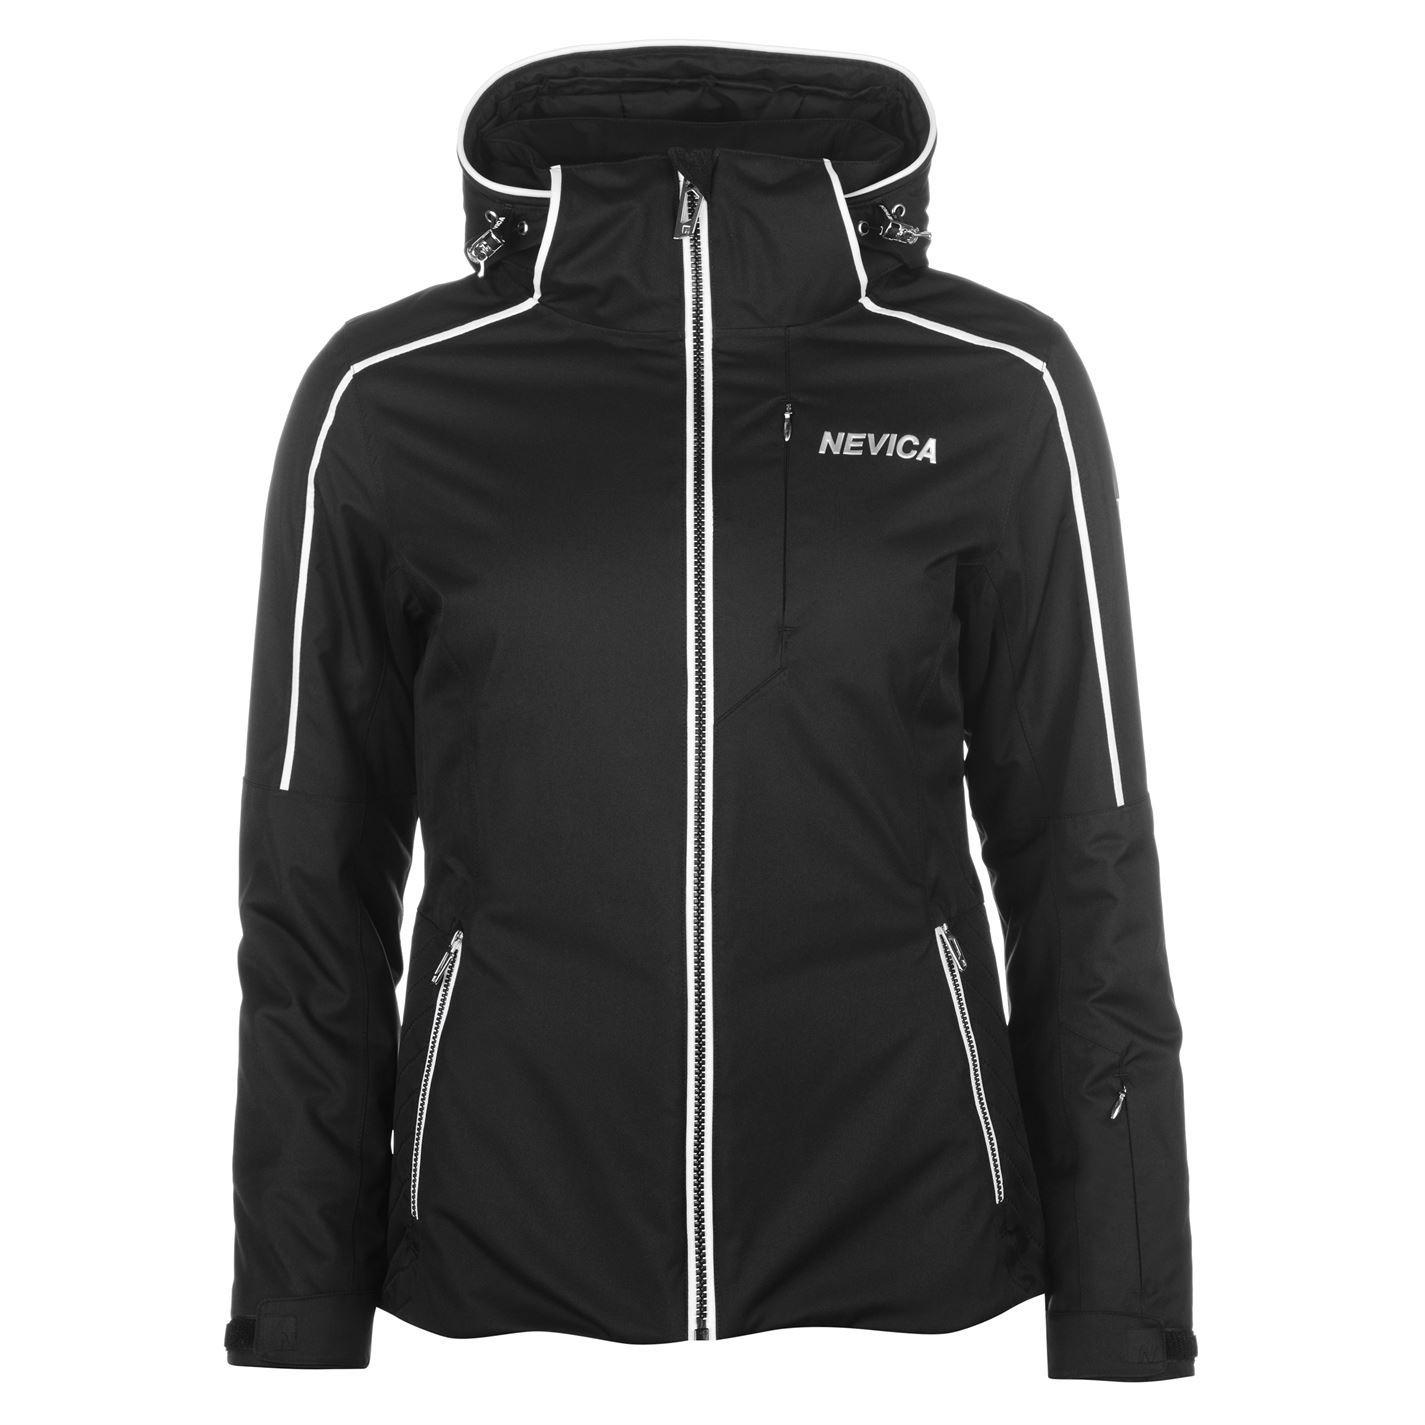 2b25080a75cc Nevica Womens Vail Ski Jacket Coat Top Long Sleeve Waterproof ...